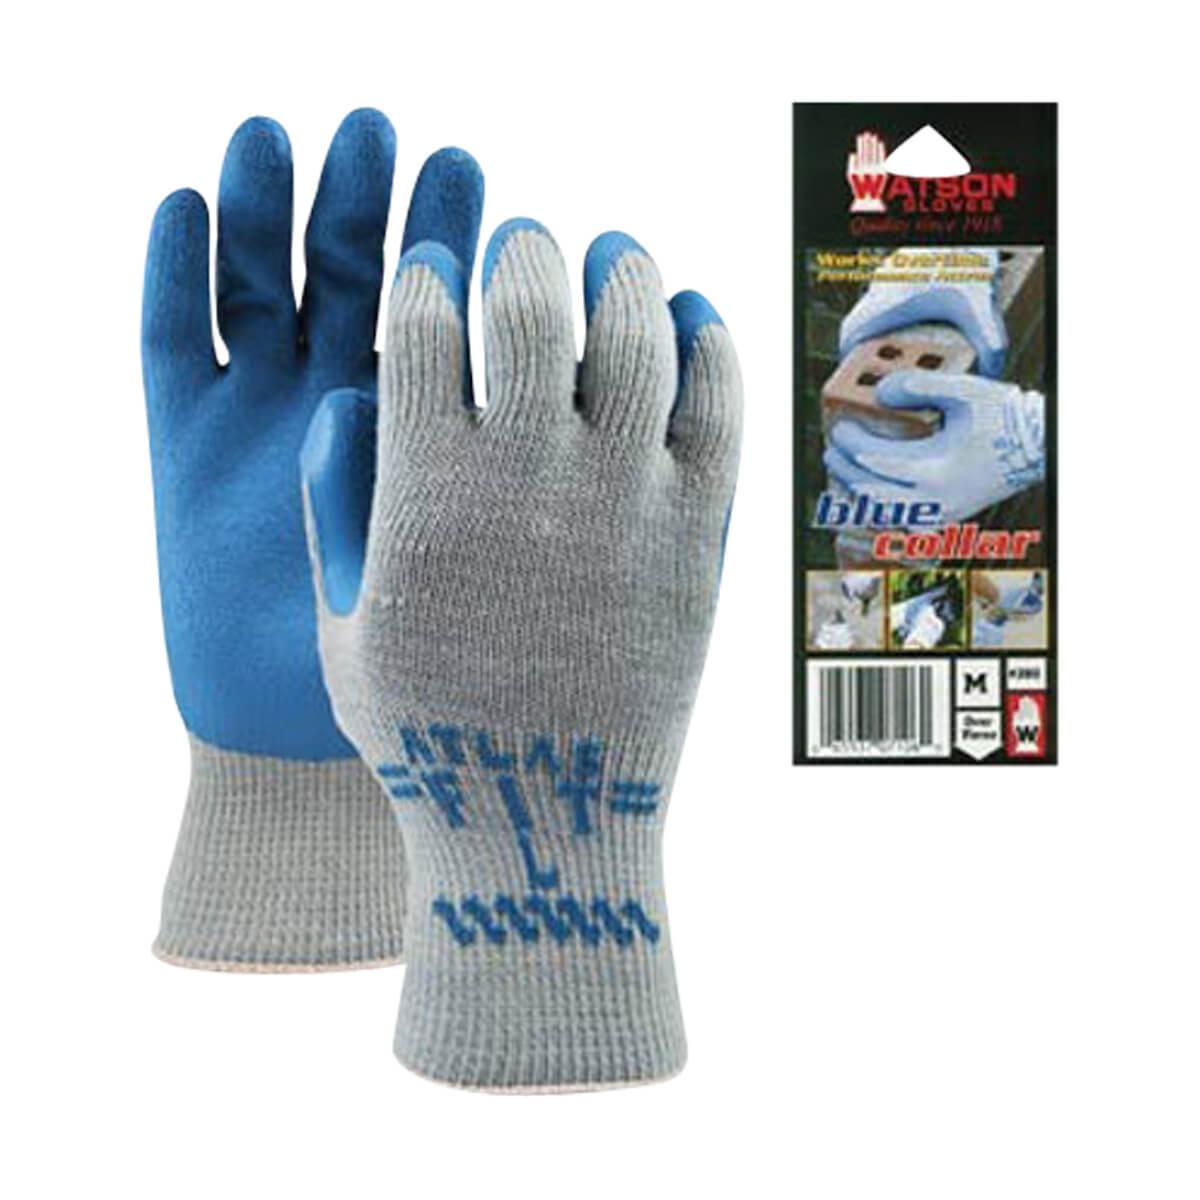 Blue Collar Gloves